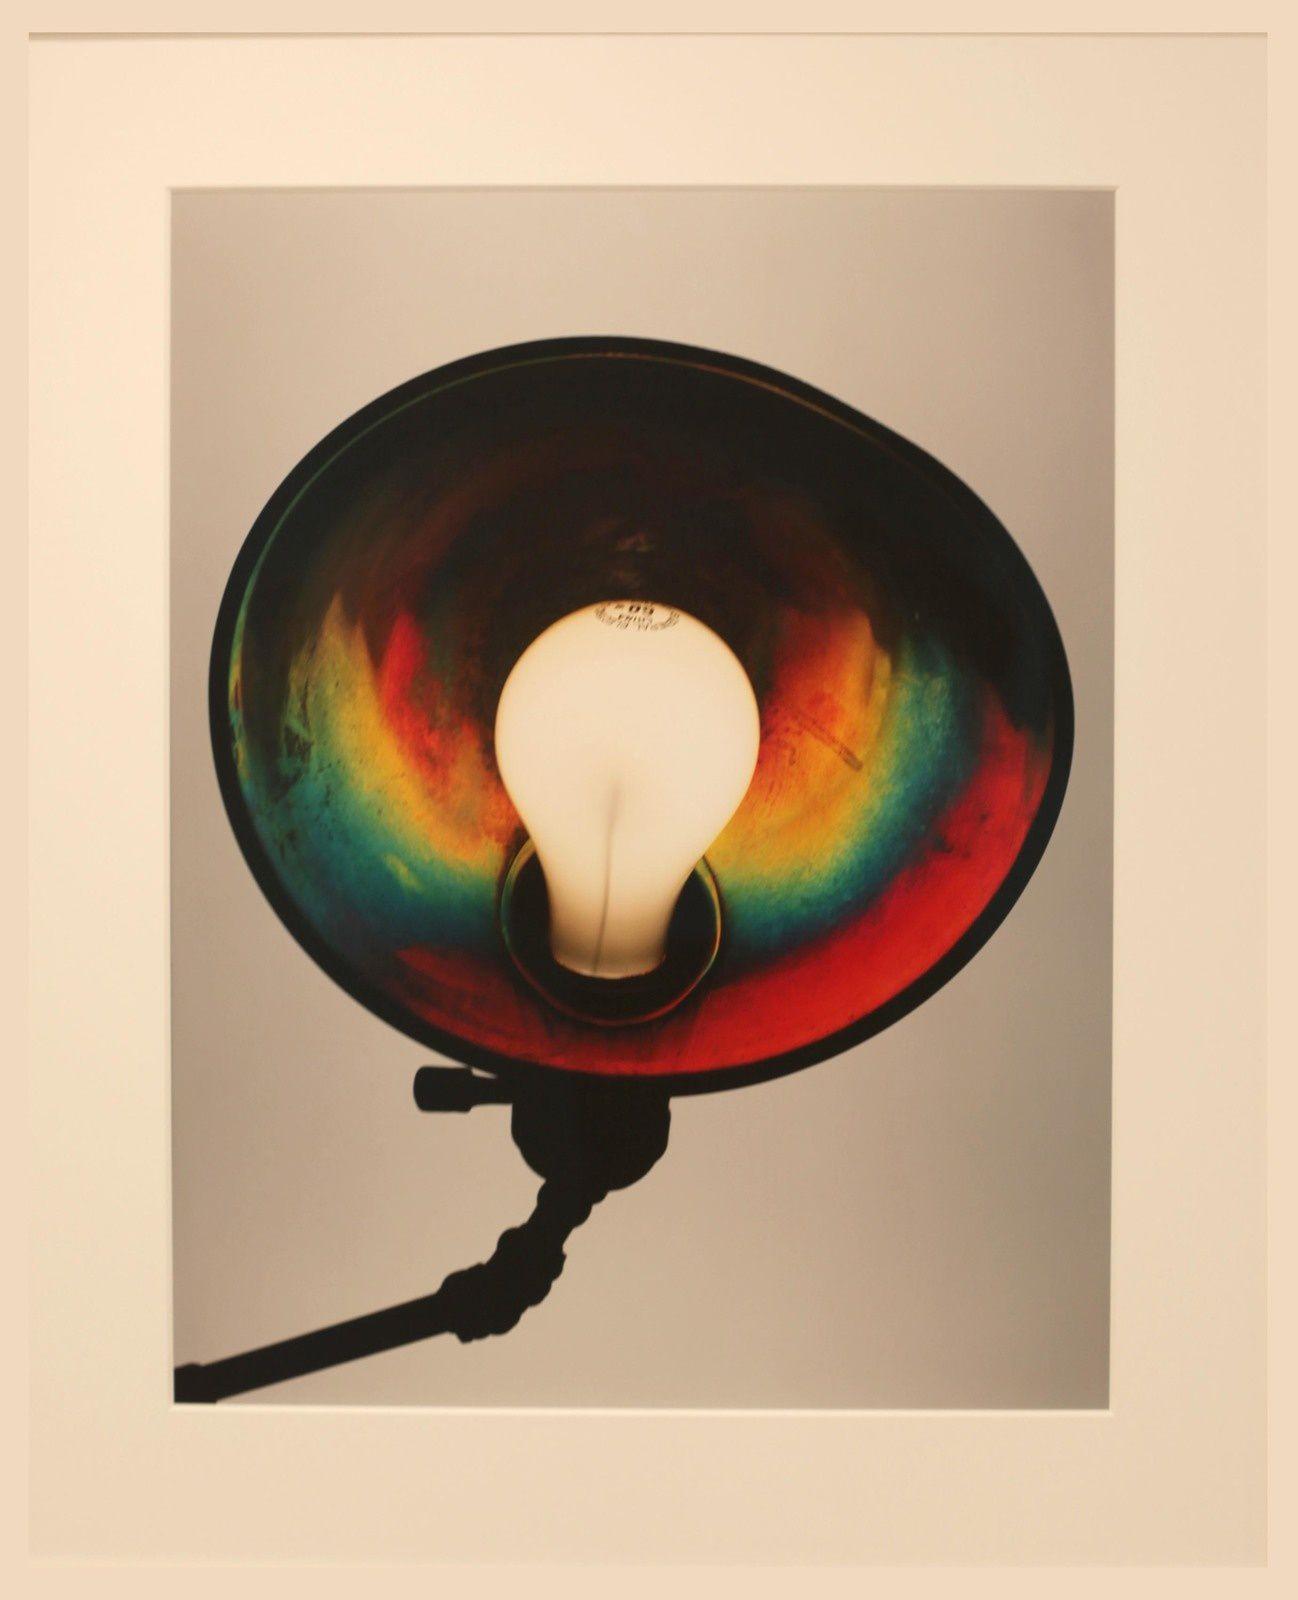 """Bedside lamp, new york, 2006 de Irving PENN - Courtesy Galerie Thaddaeus Ropac © Photo Éric Simon"